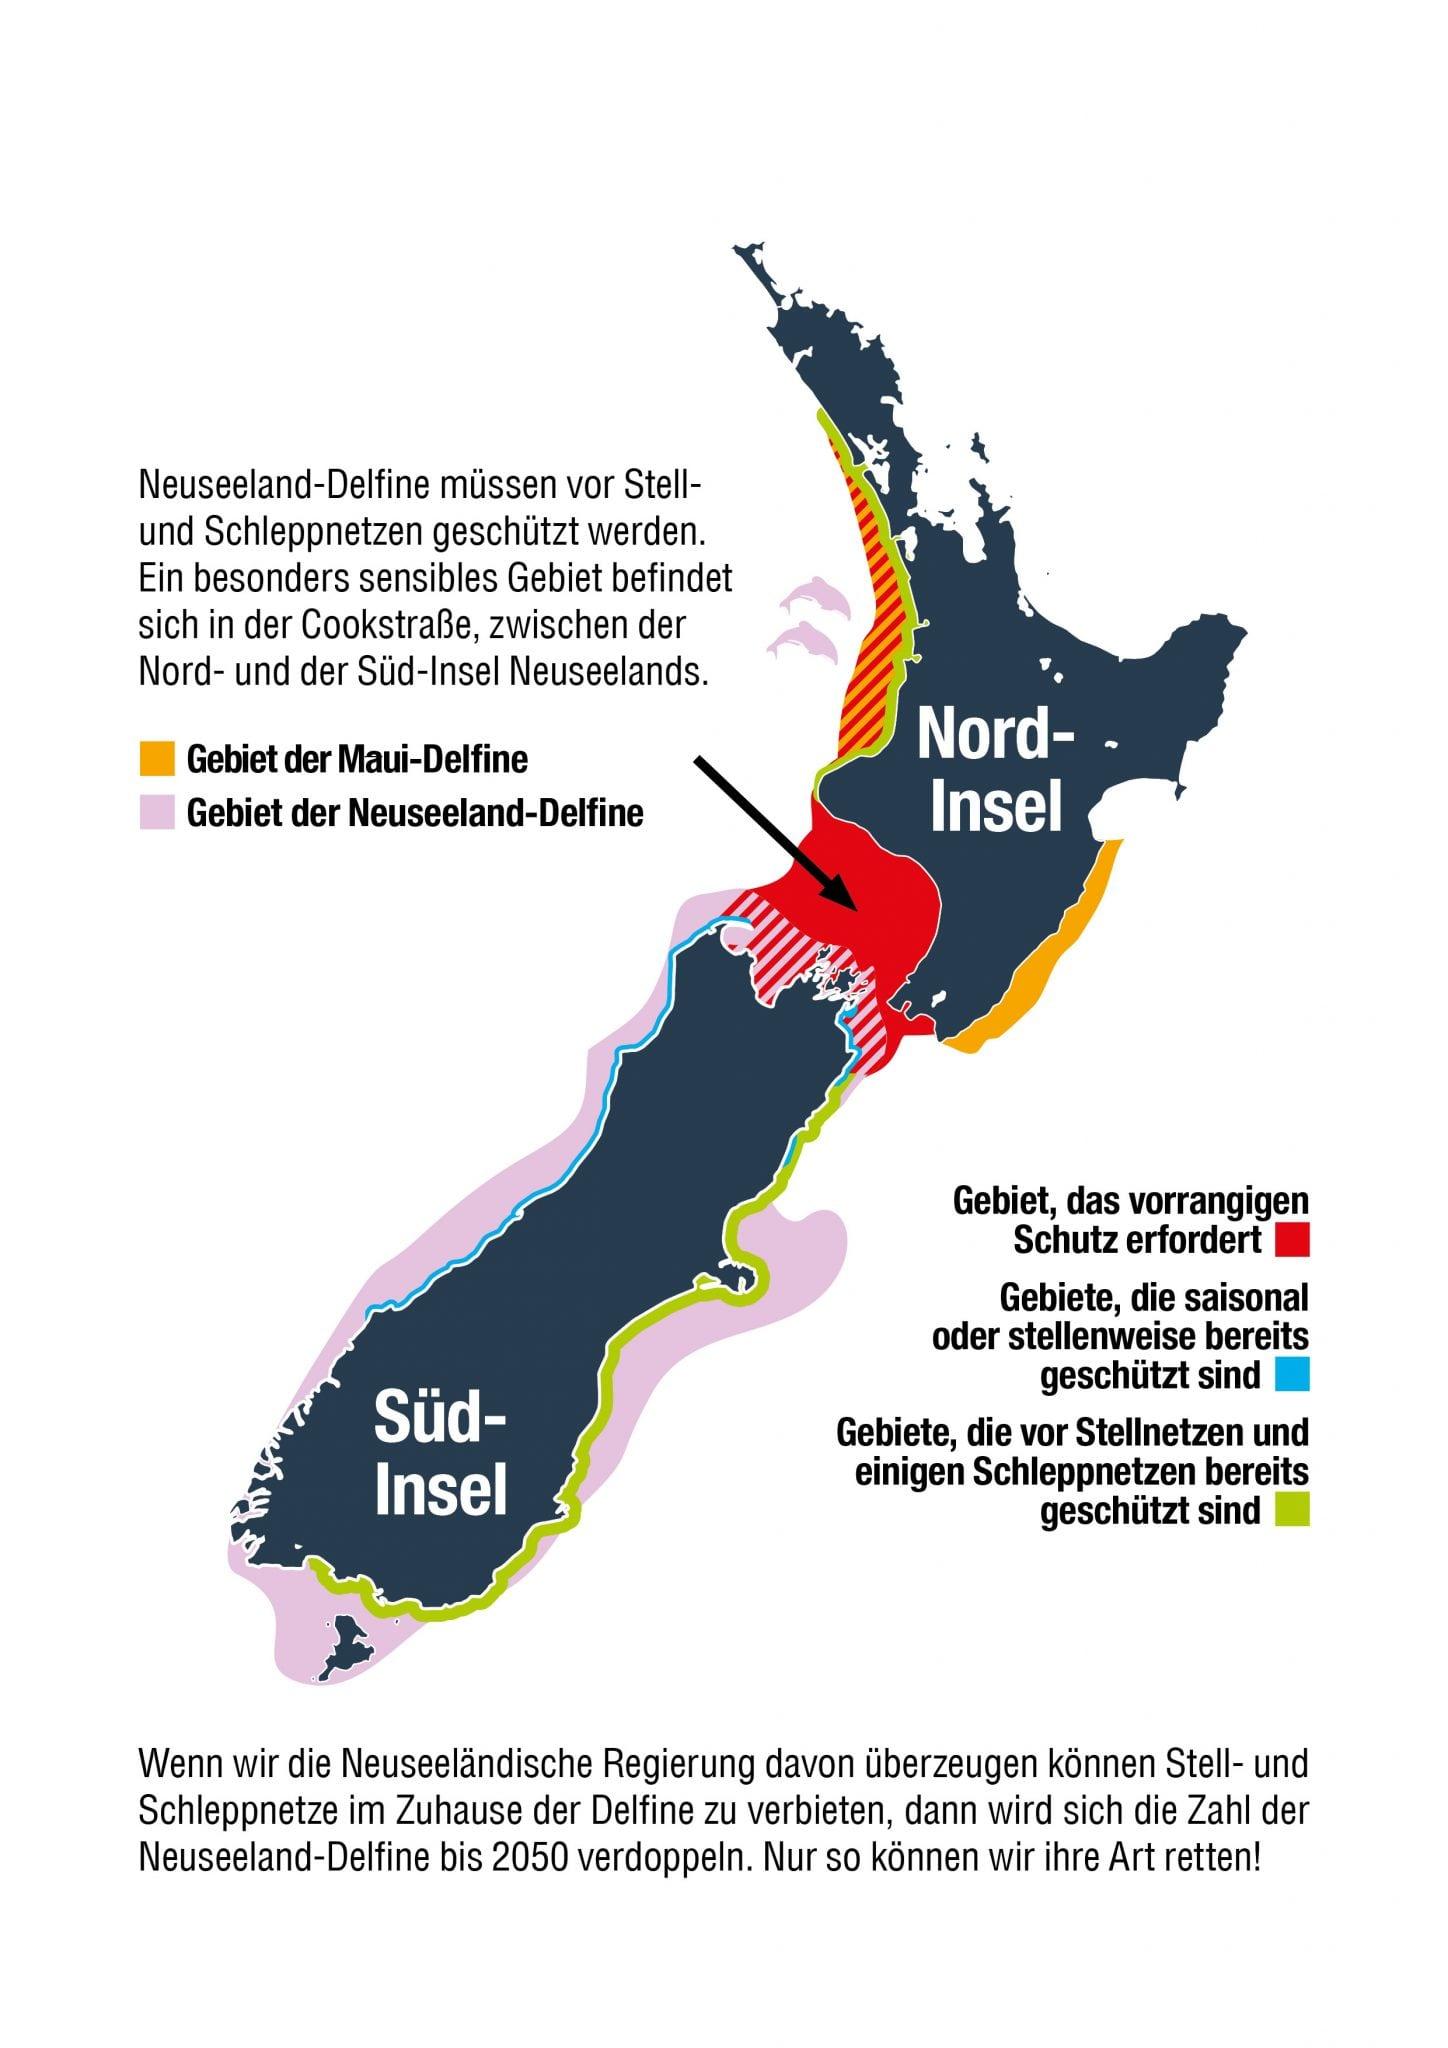 Verbreitung Neuseeland-Delfine